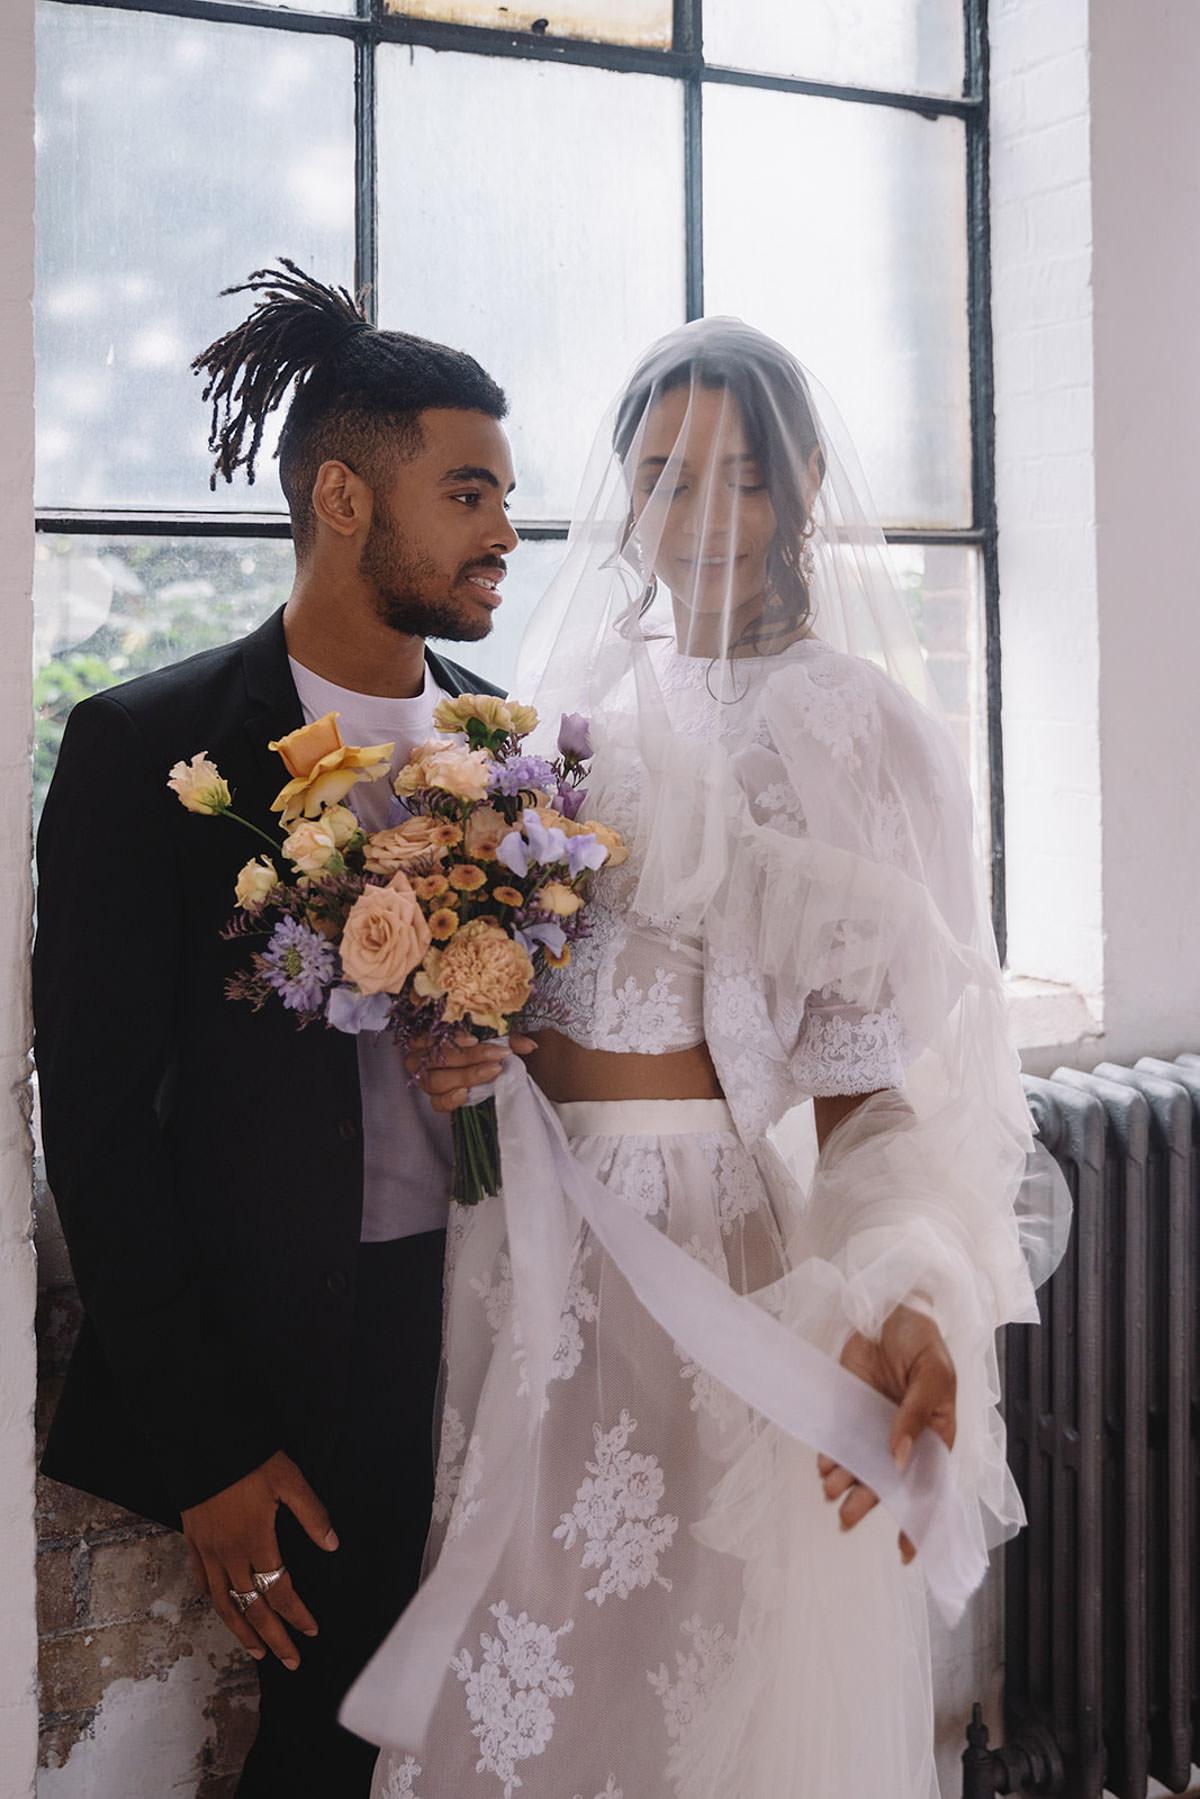 Urban Romance - Modern Loft Style Wedding Inspiration with pastel details